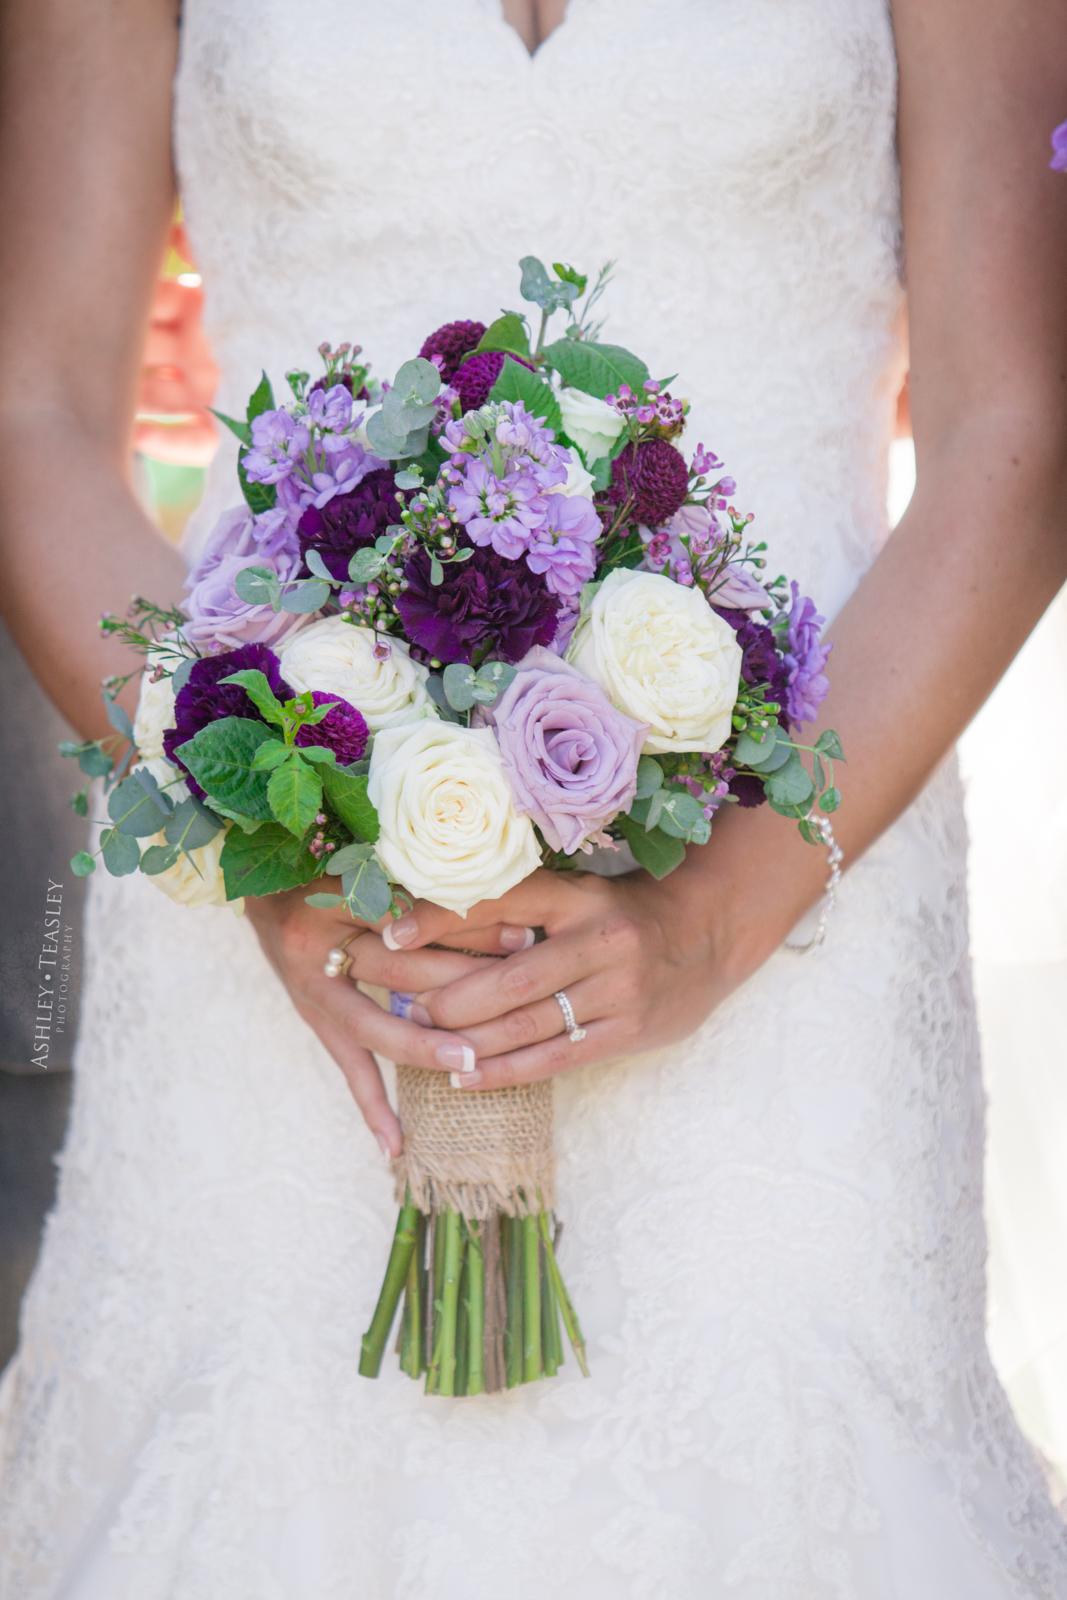 Ashley Teasley Photography - Amador Cellars Winery - Sacramento Wedding Photographer-122.JPG